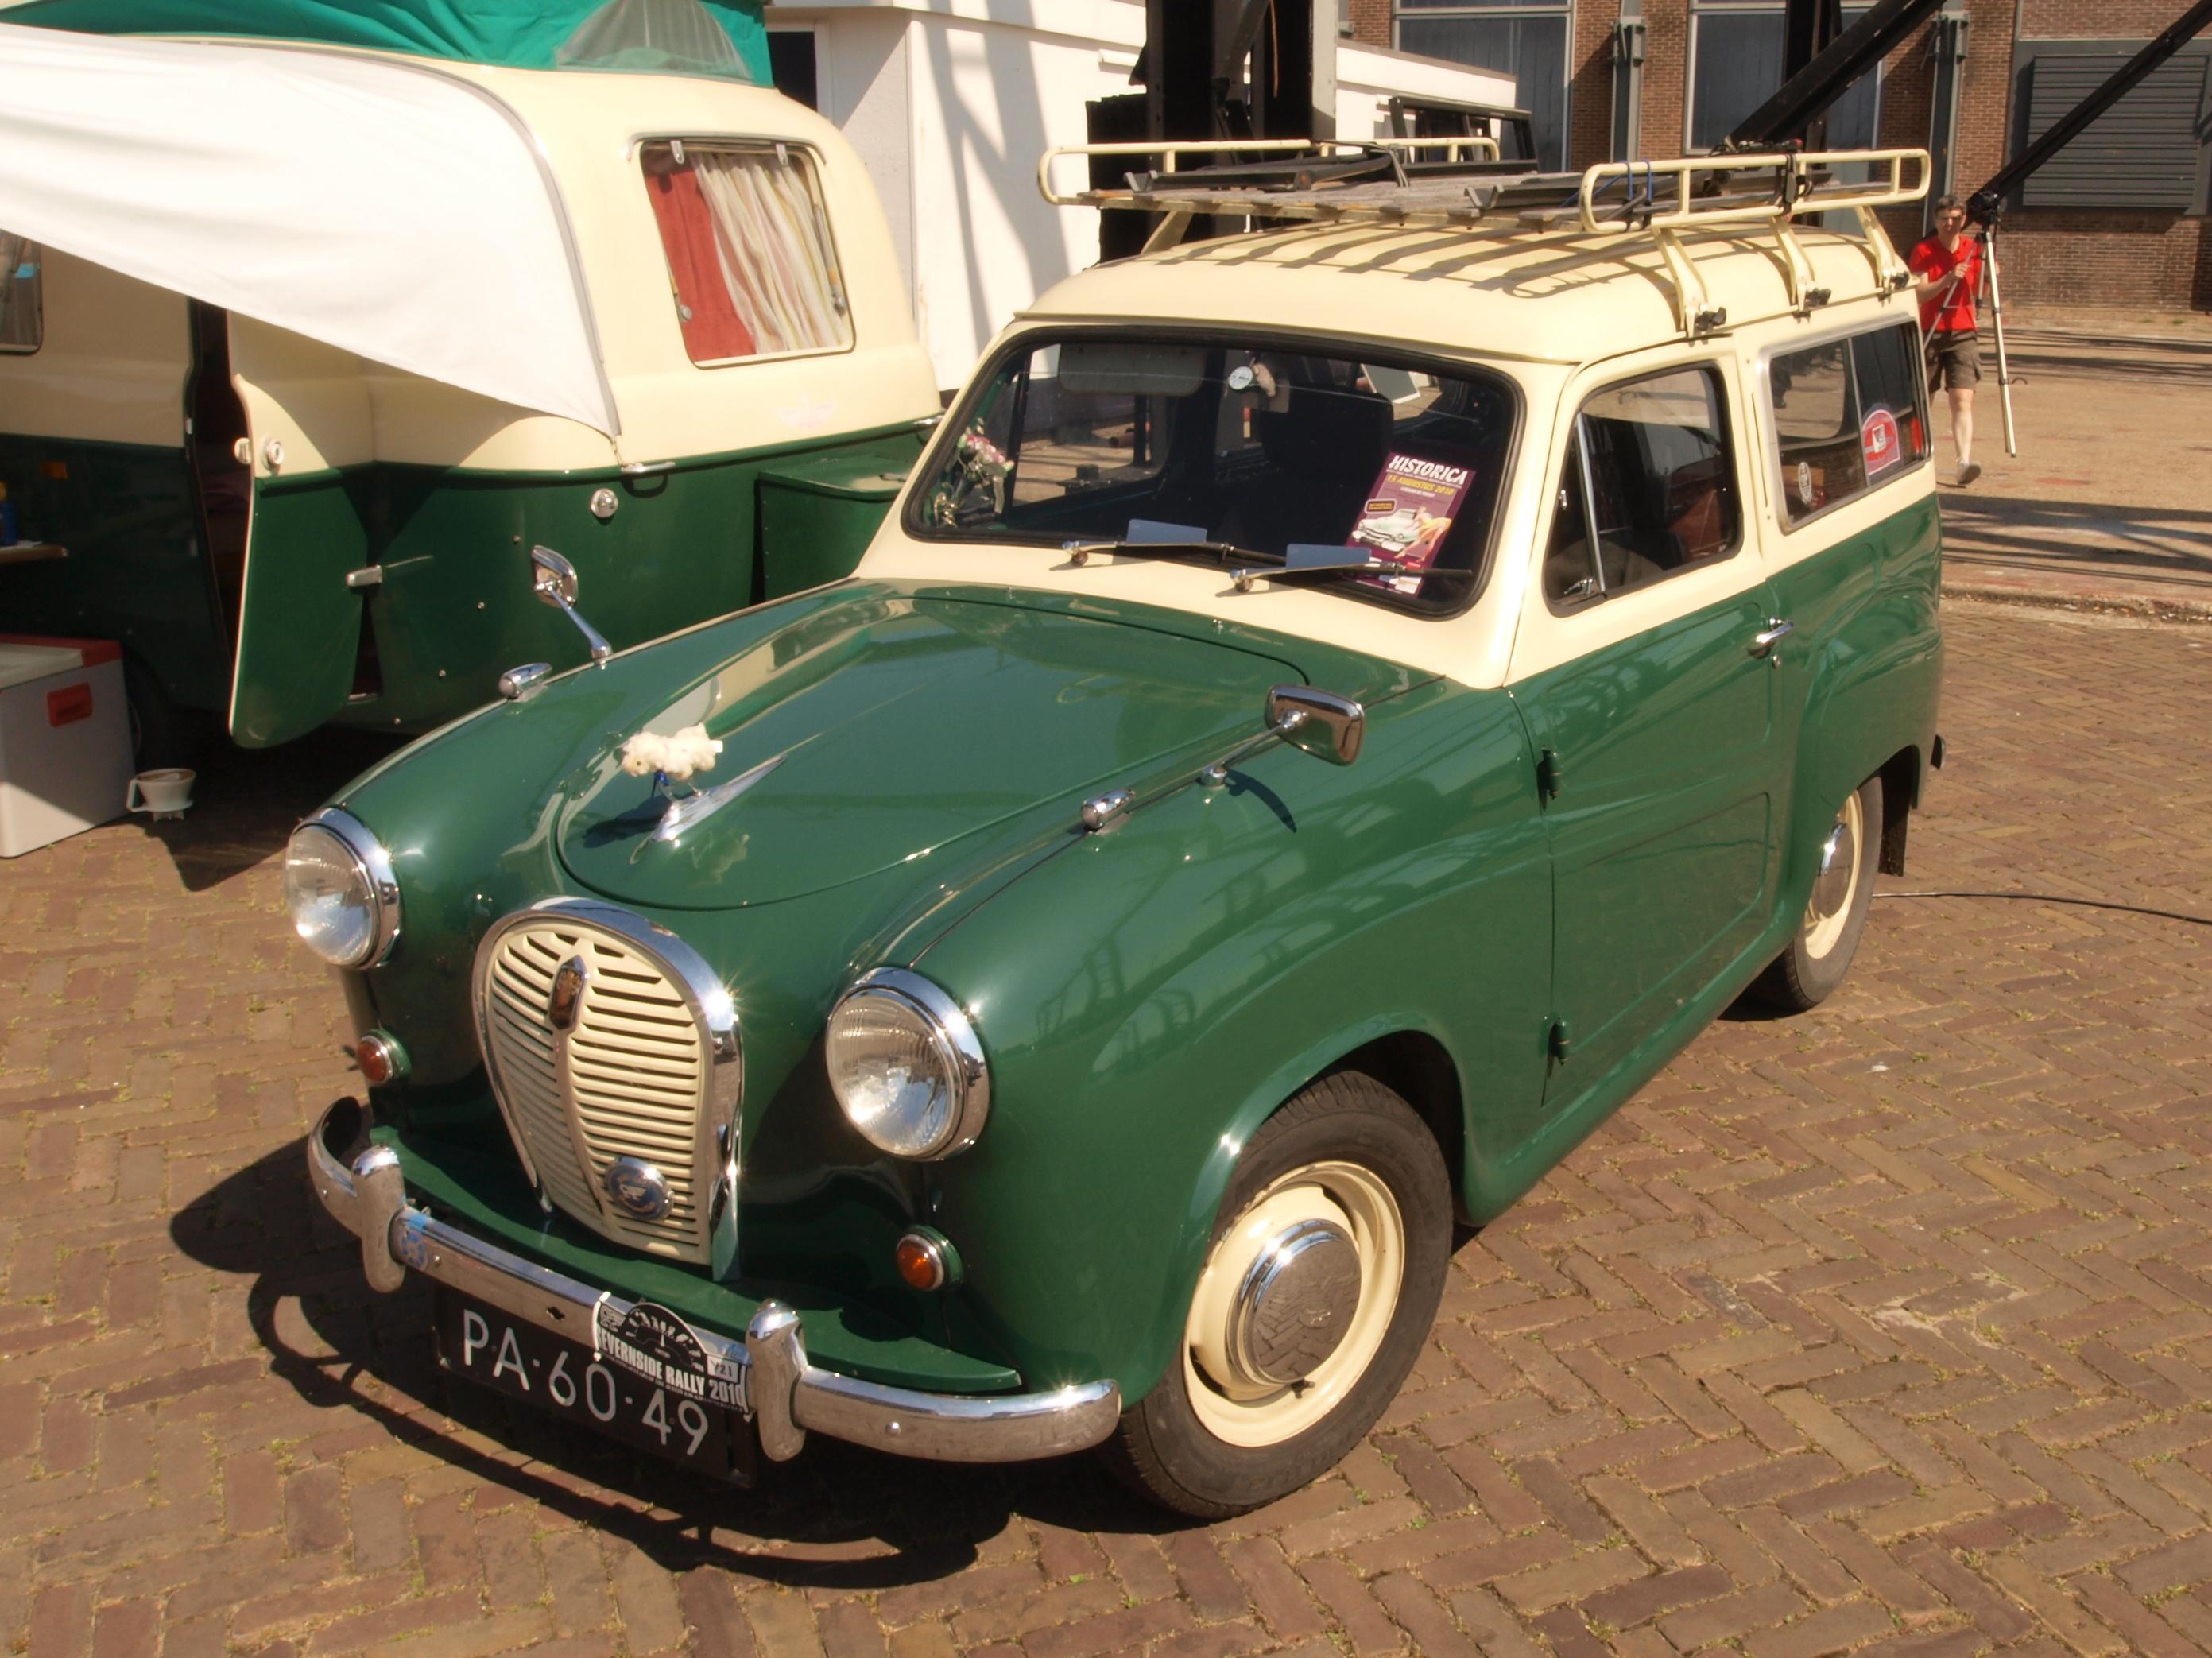 File:Austin A30 (1955), Dutch licence registration PA-60-49 pic3 ...